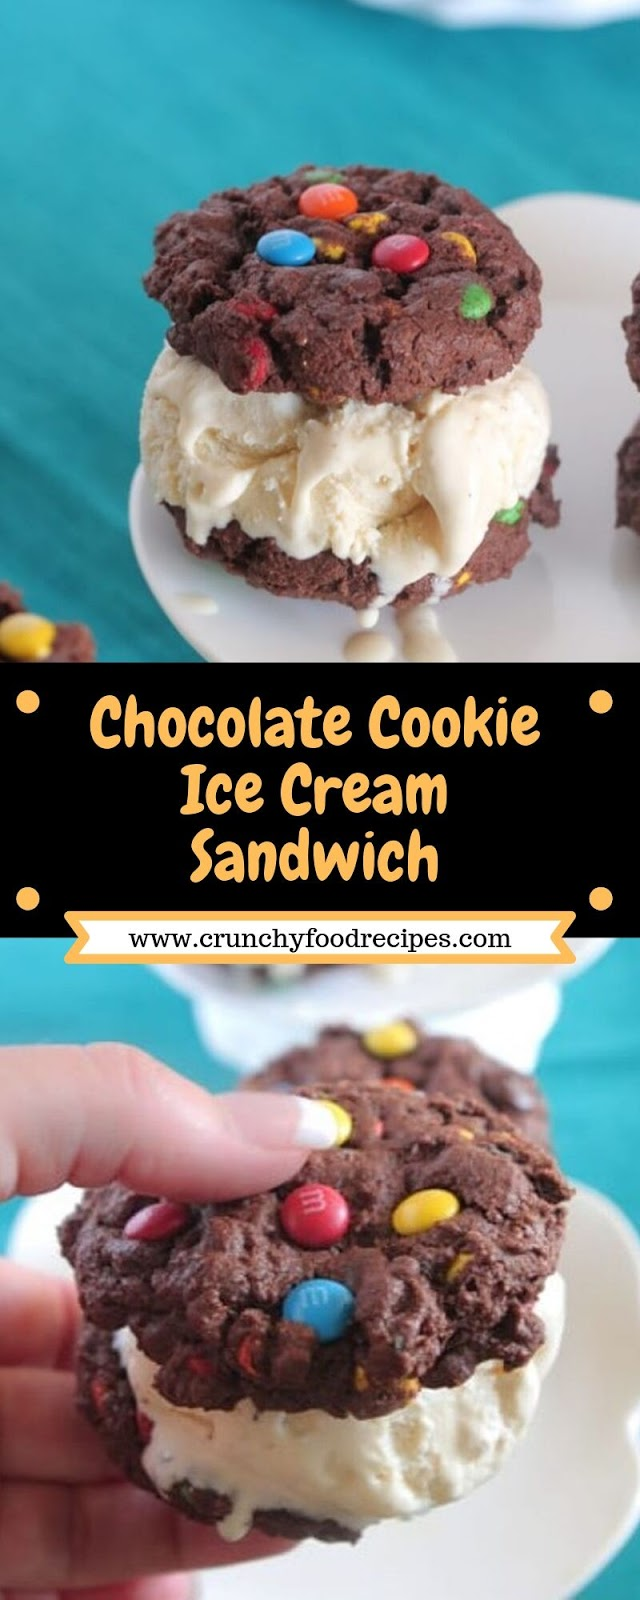 Chocolate Cookie Ice Cream Sandwich